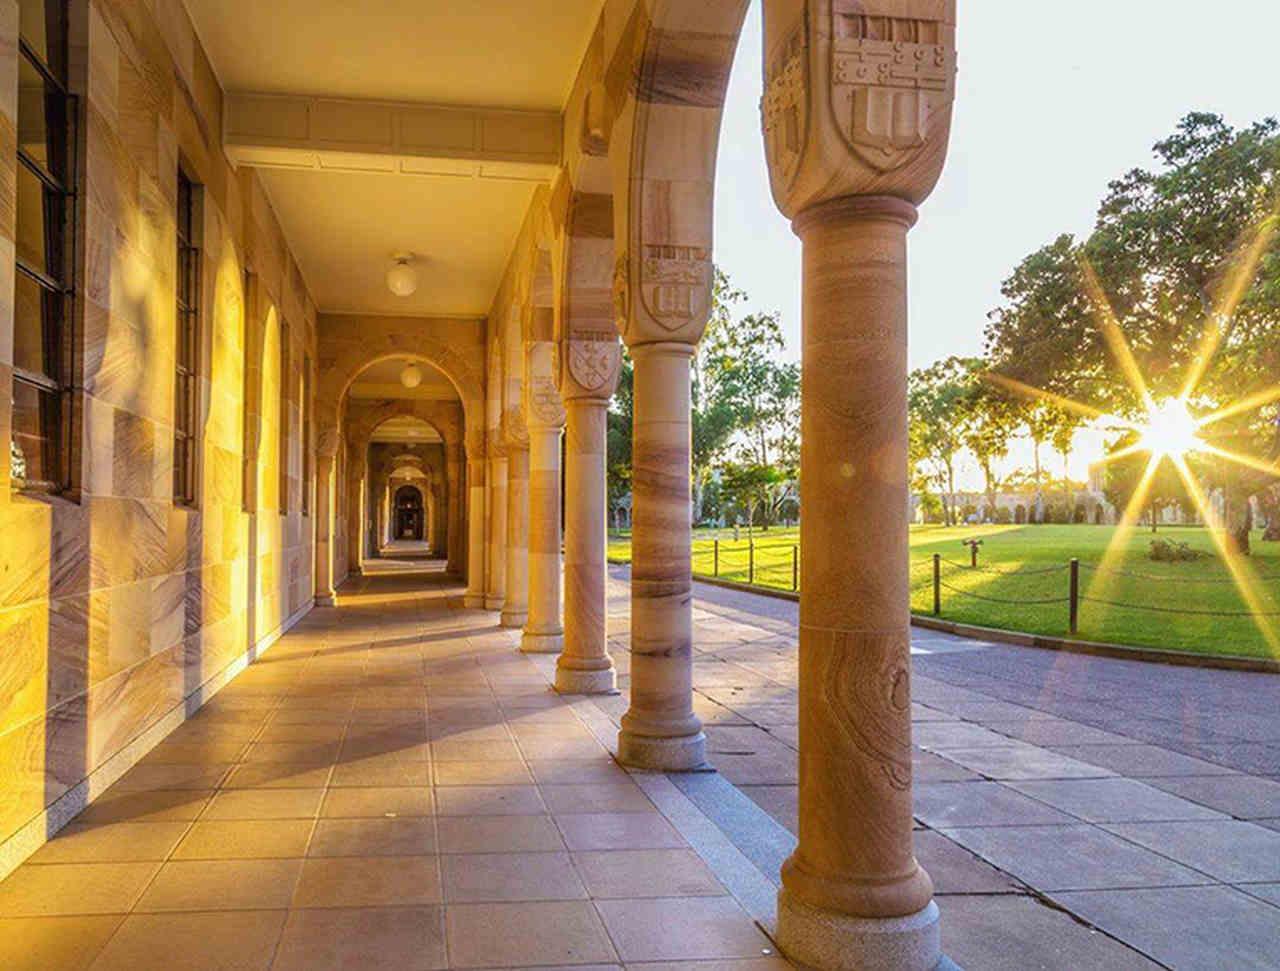 Light, Building, Yellow, Lighting, Architecture, Column, Tree, The University of Queensland